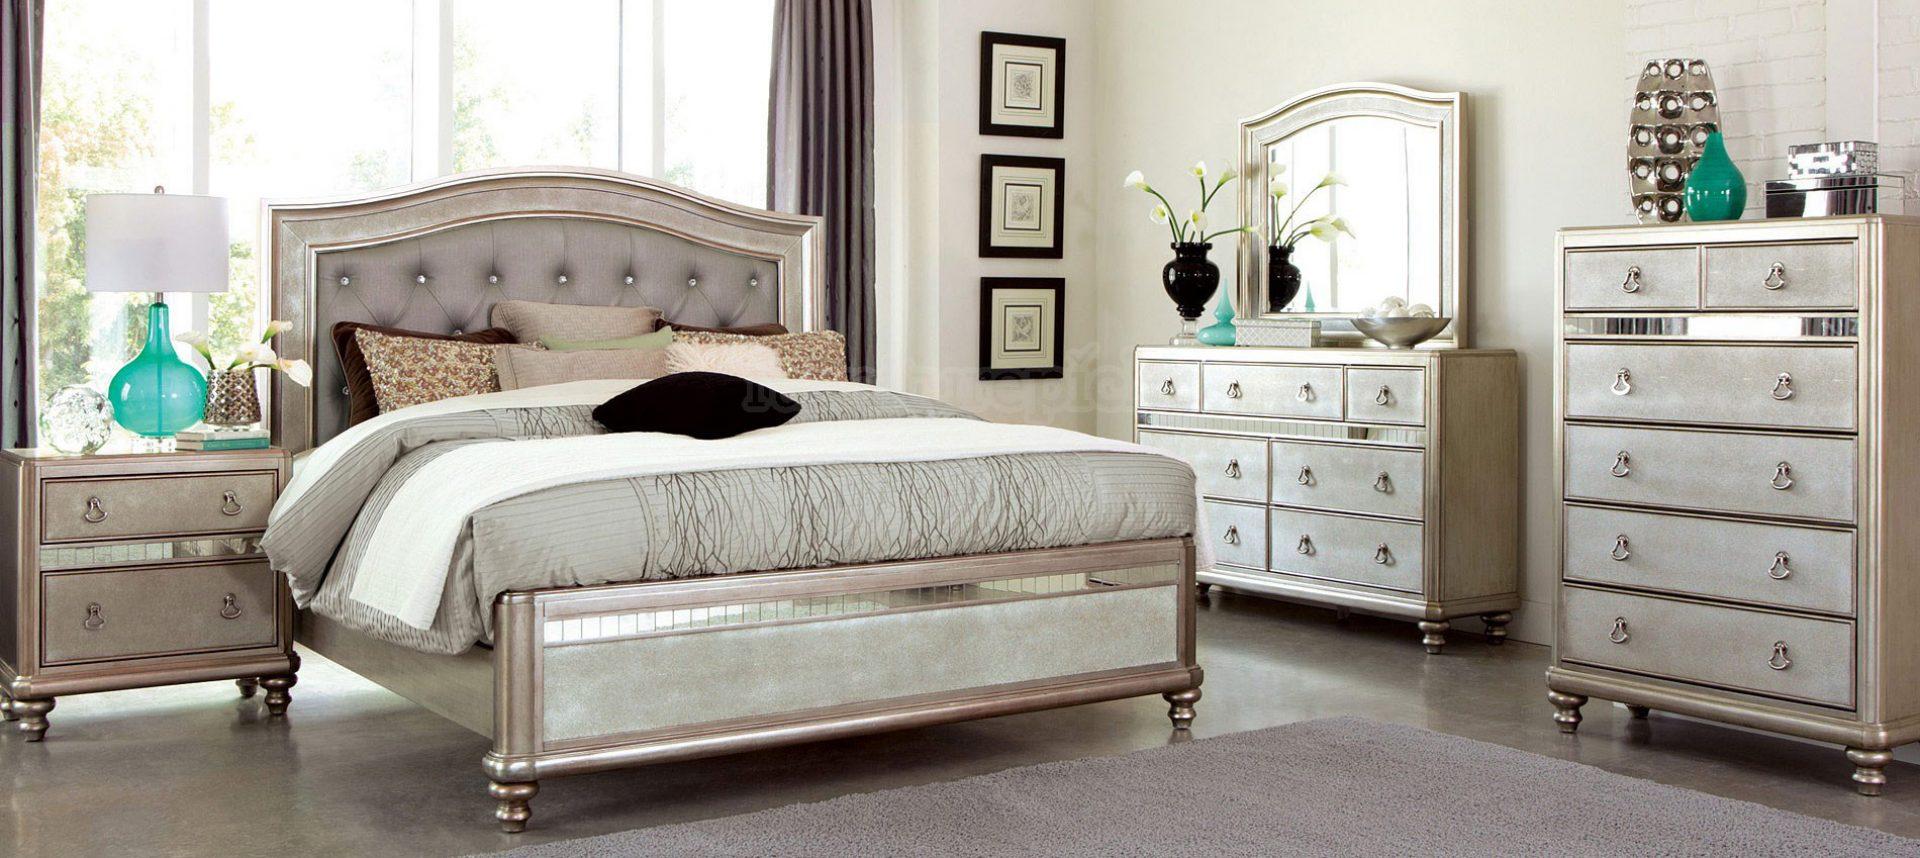 Mattress Furniture Liquidation Name Brands At Discount Prices